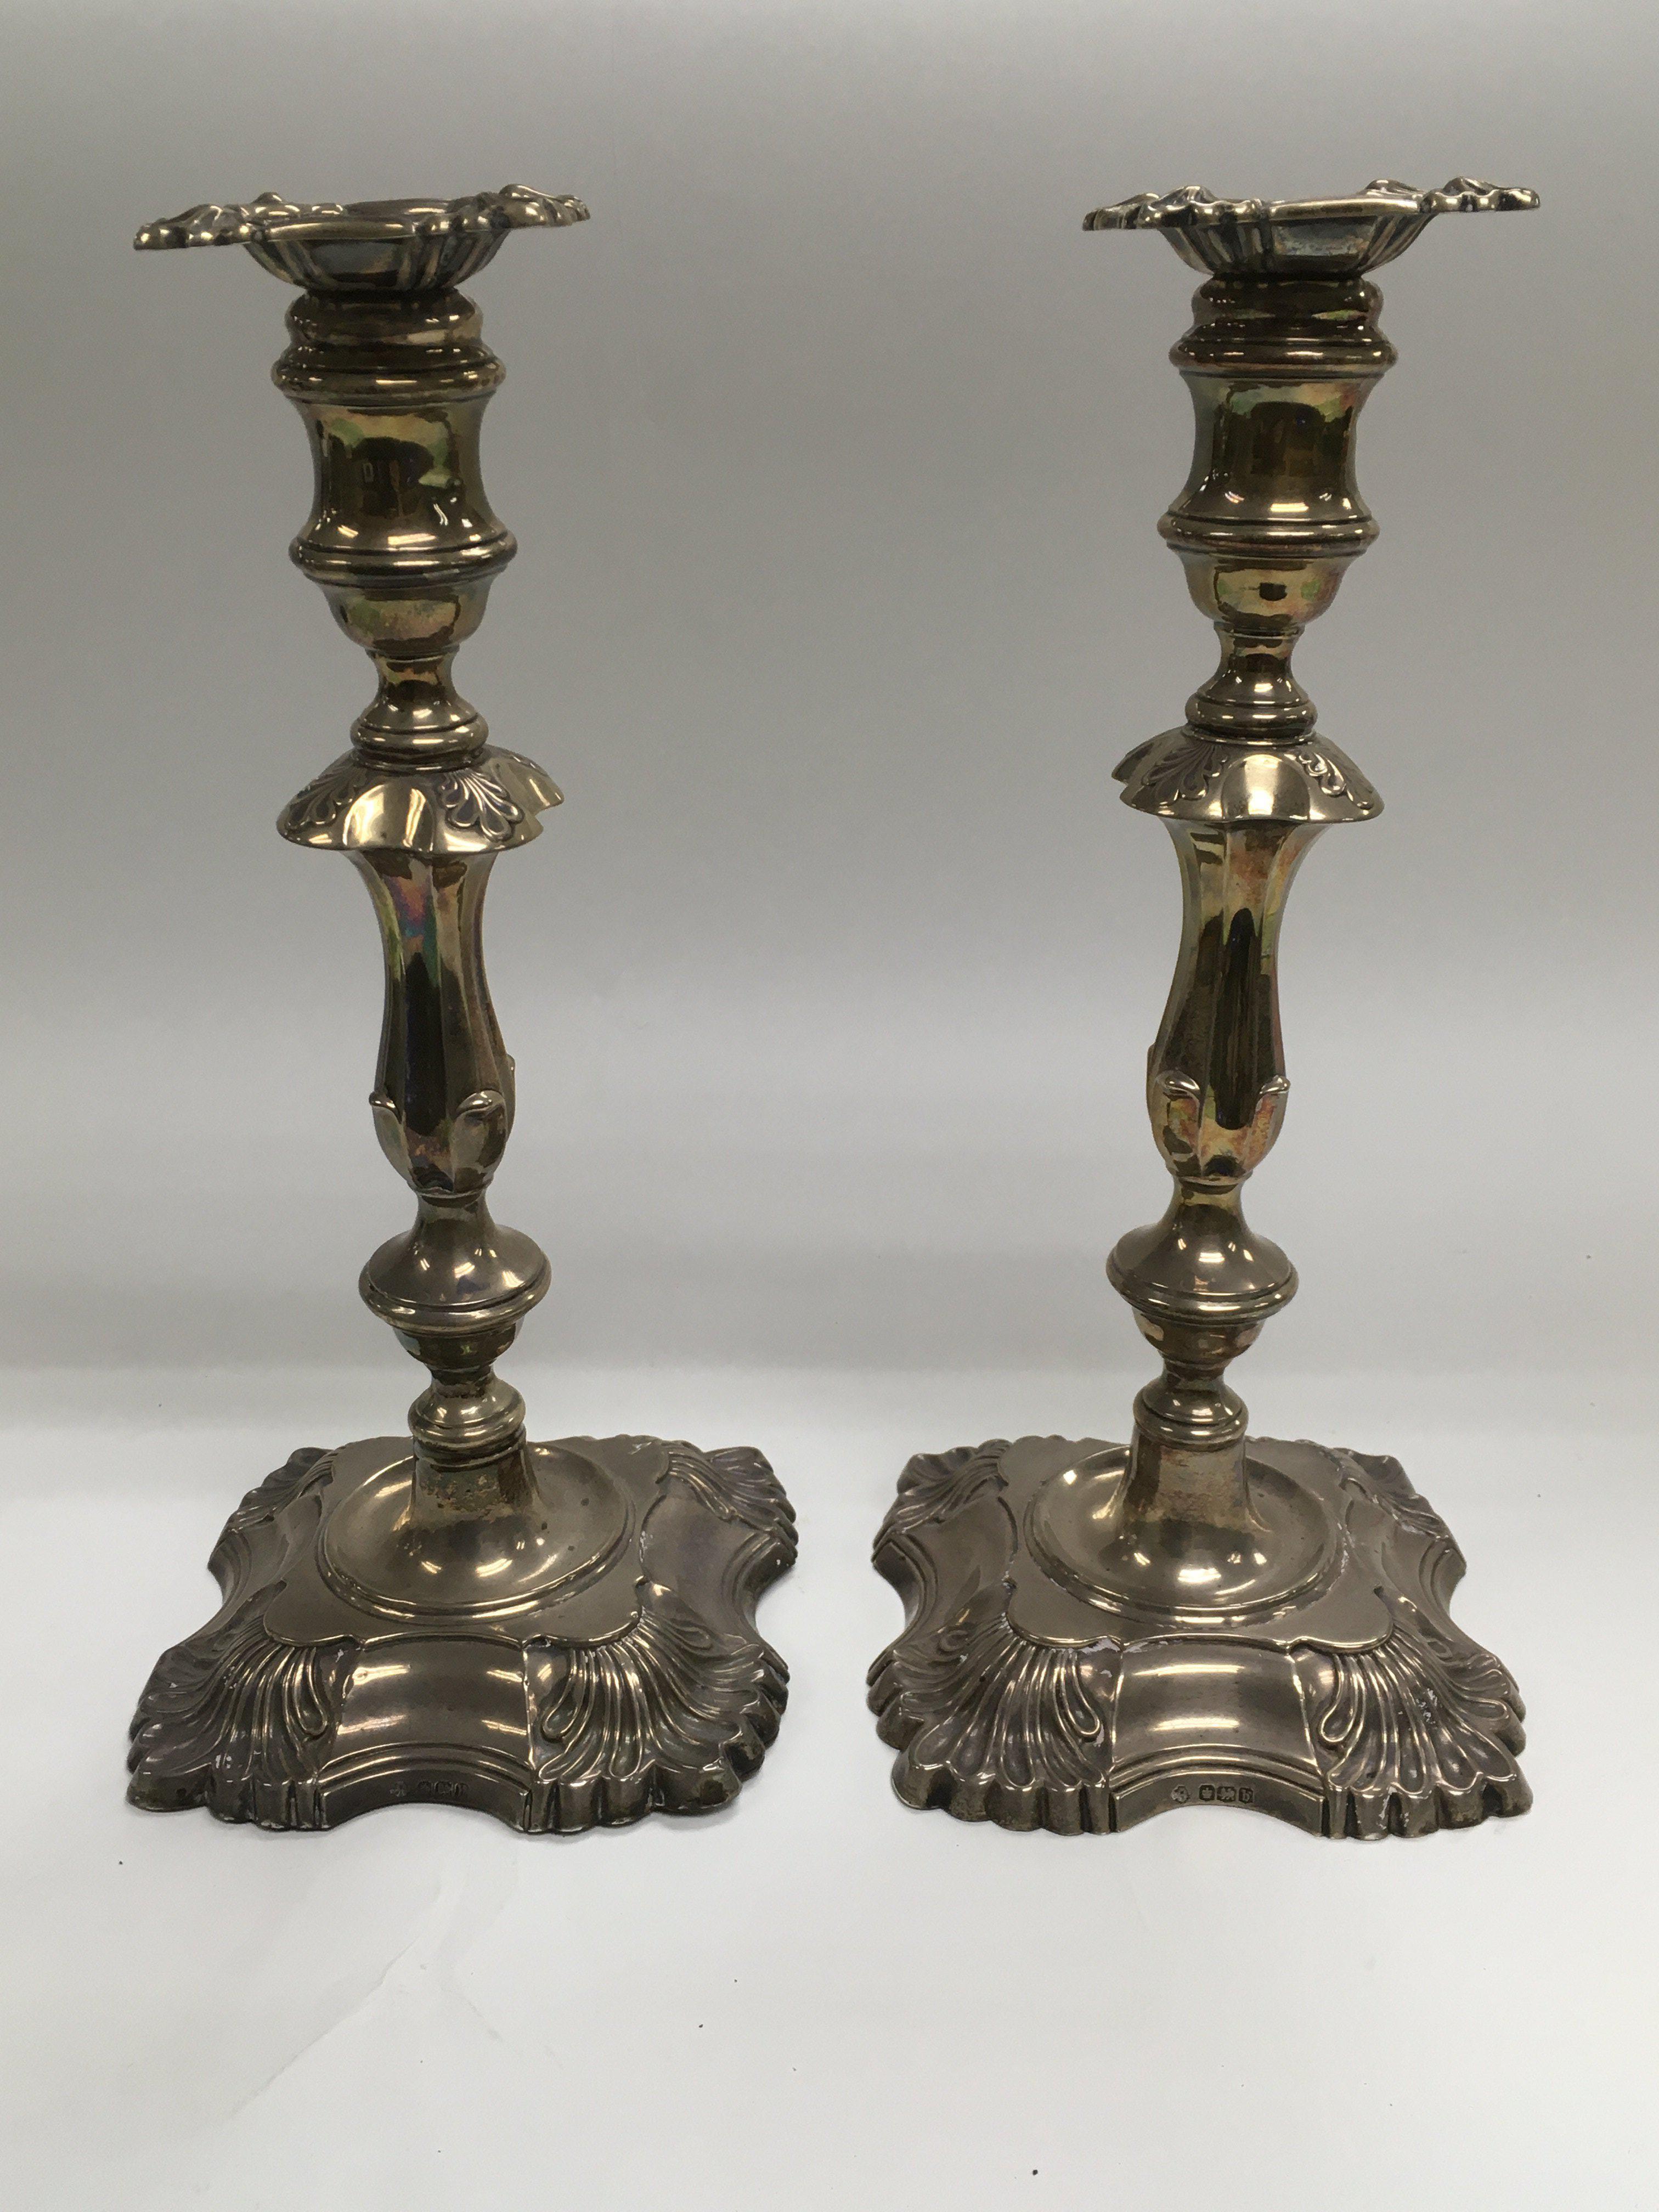 Lot 47 - A pair of silver candlesticks, Sheffield hallmarks